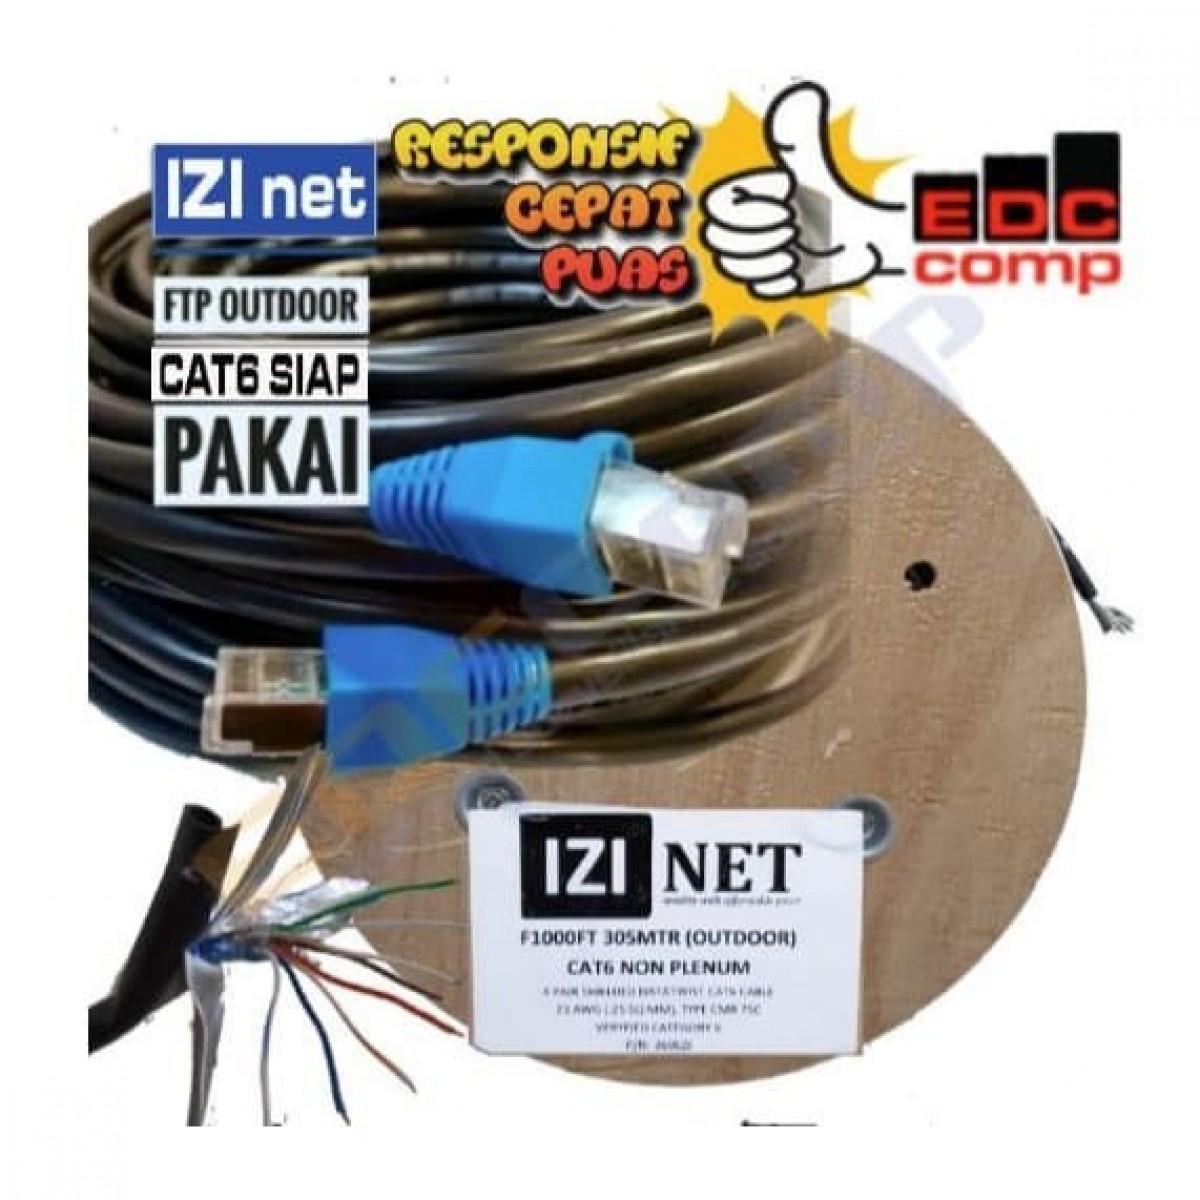 Cable STP/FTP Cat 6 Outdoor Cable 75 Meter IZI net Original - EdcComp